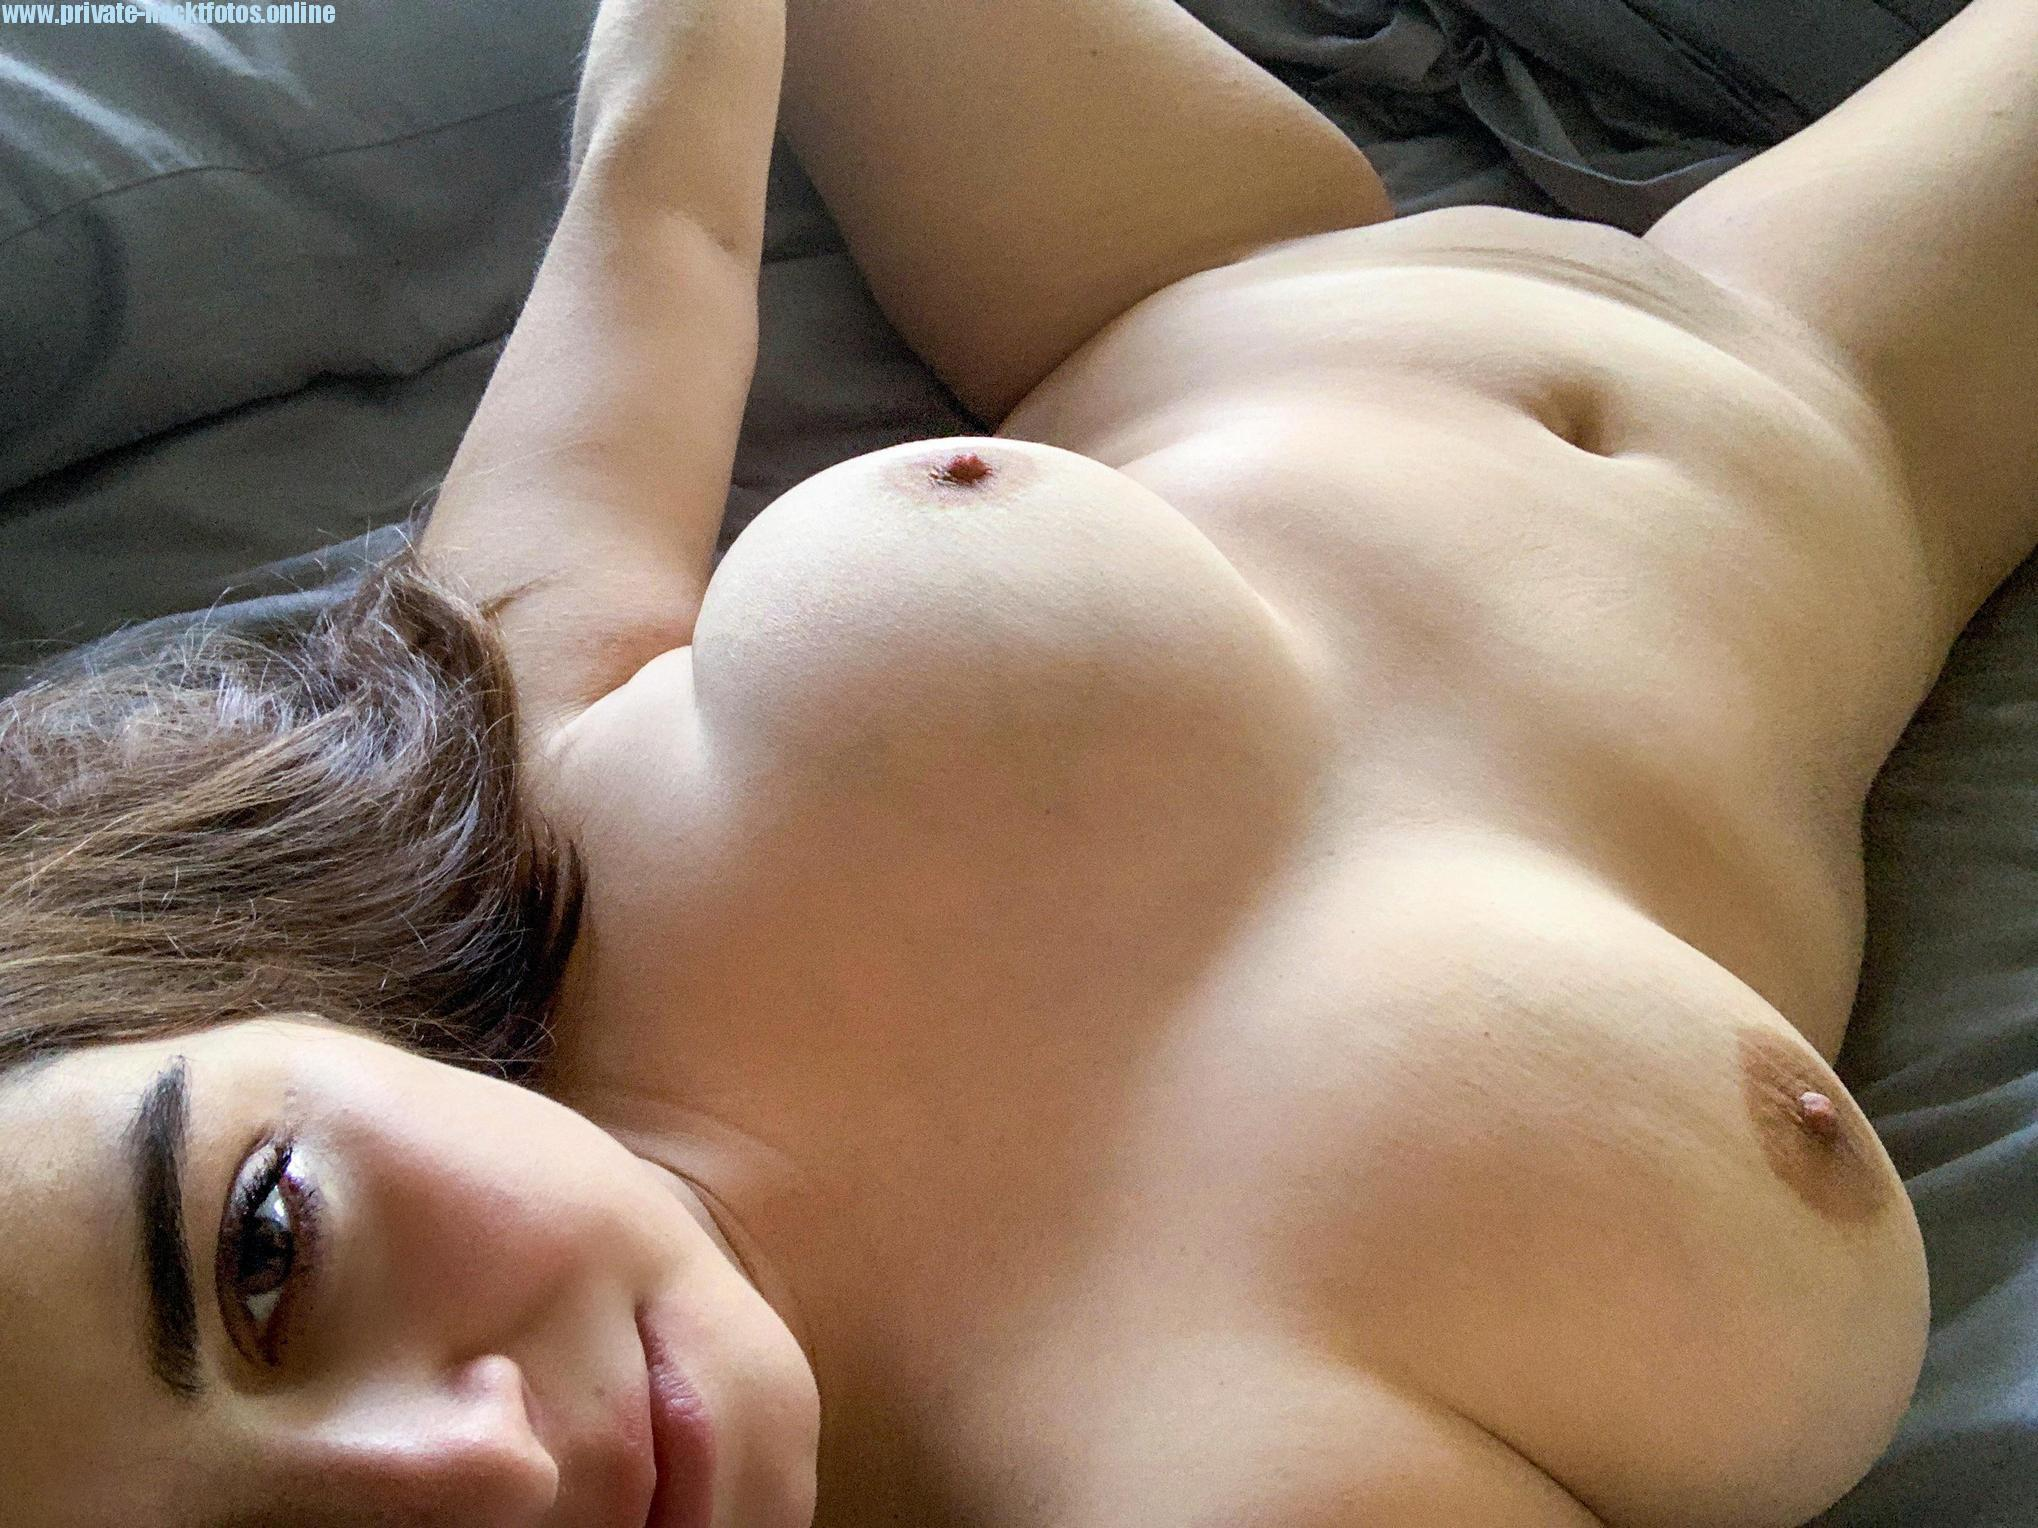 Selfie Nacktfoto Privat